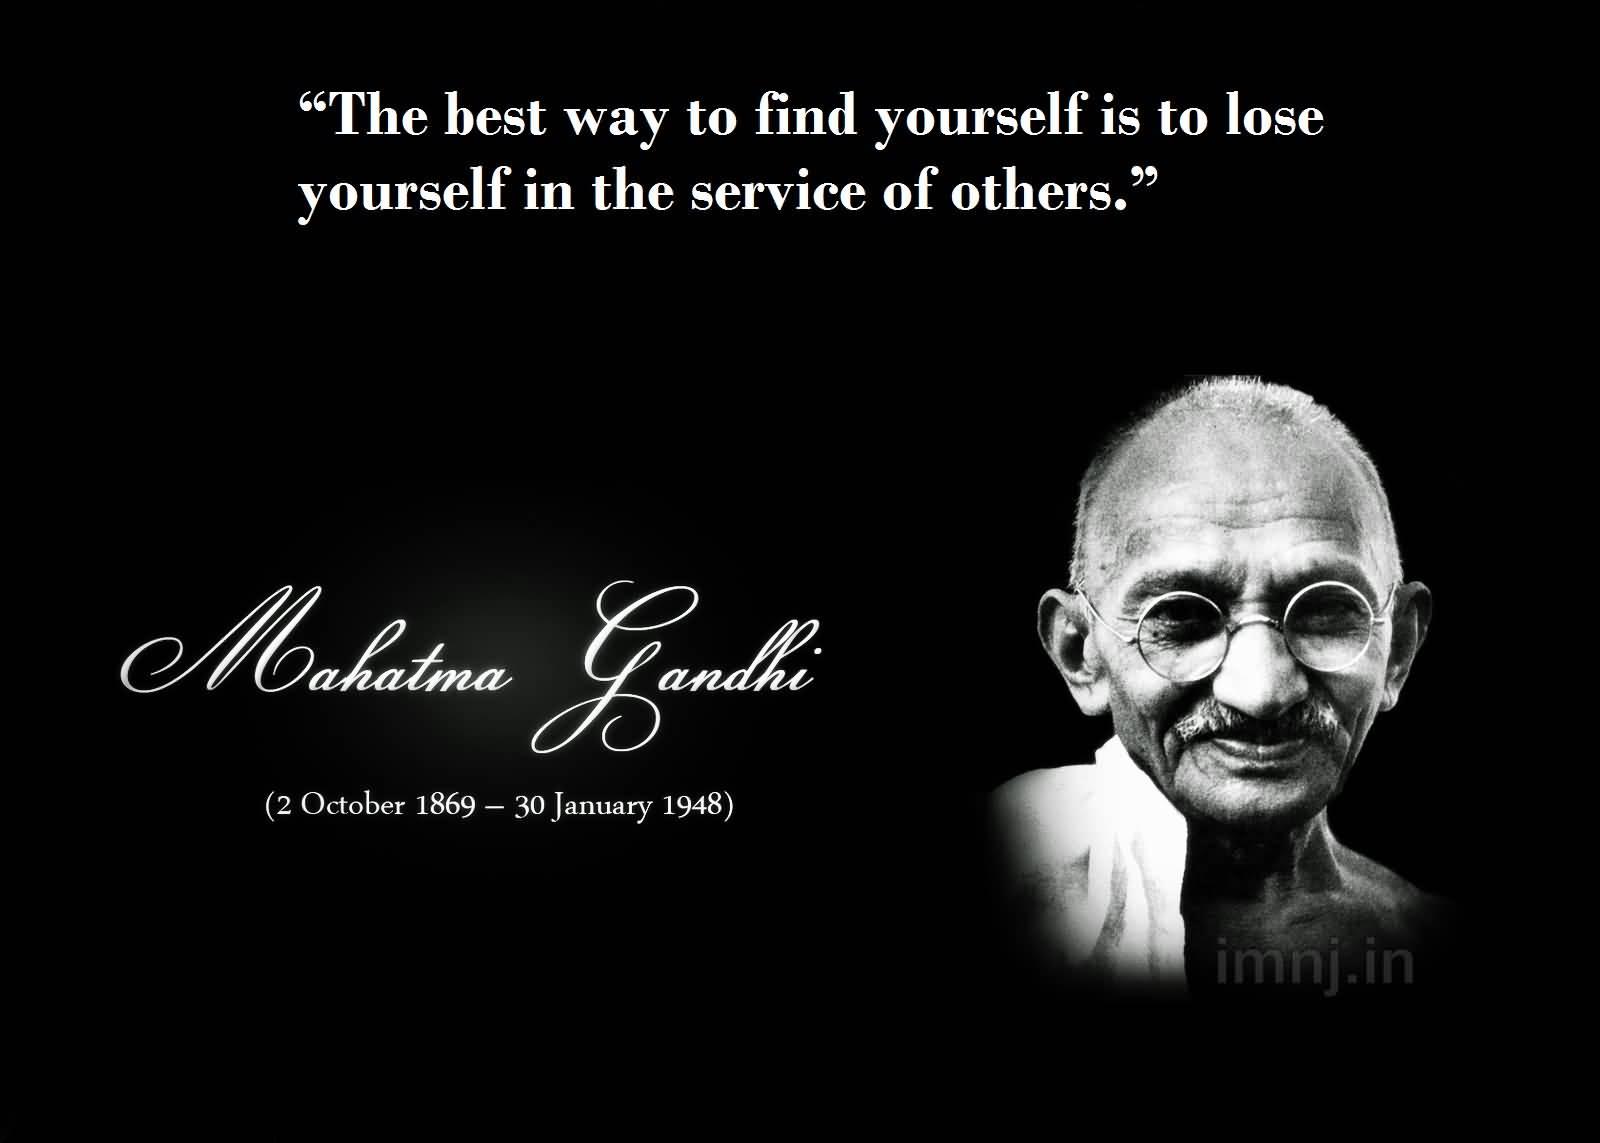 Mahatma Gandhi Quotes On Love Mahatma Gandhi Quotes On Love 10  Quotesbae